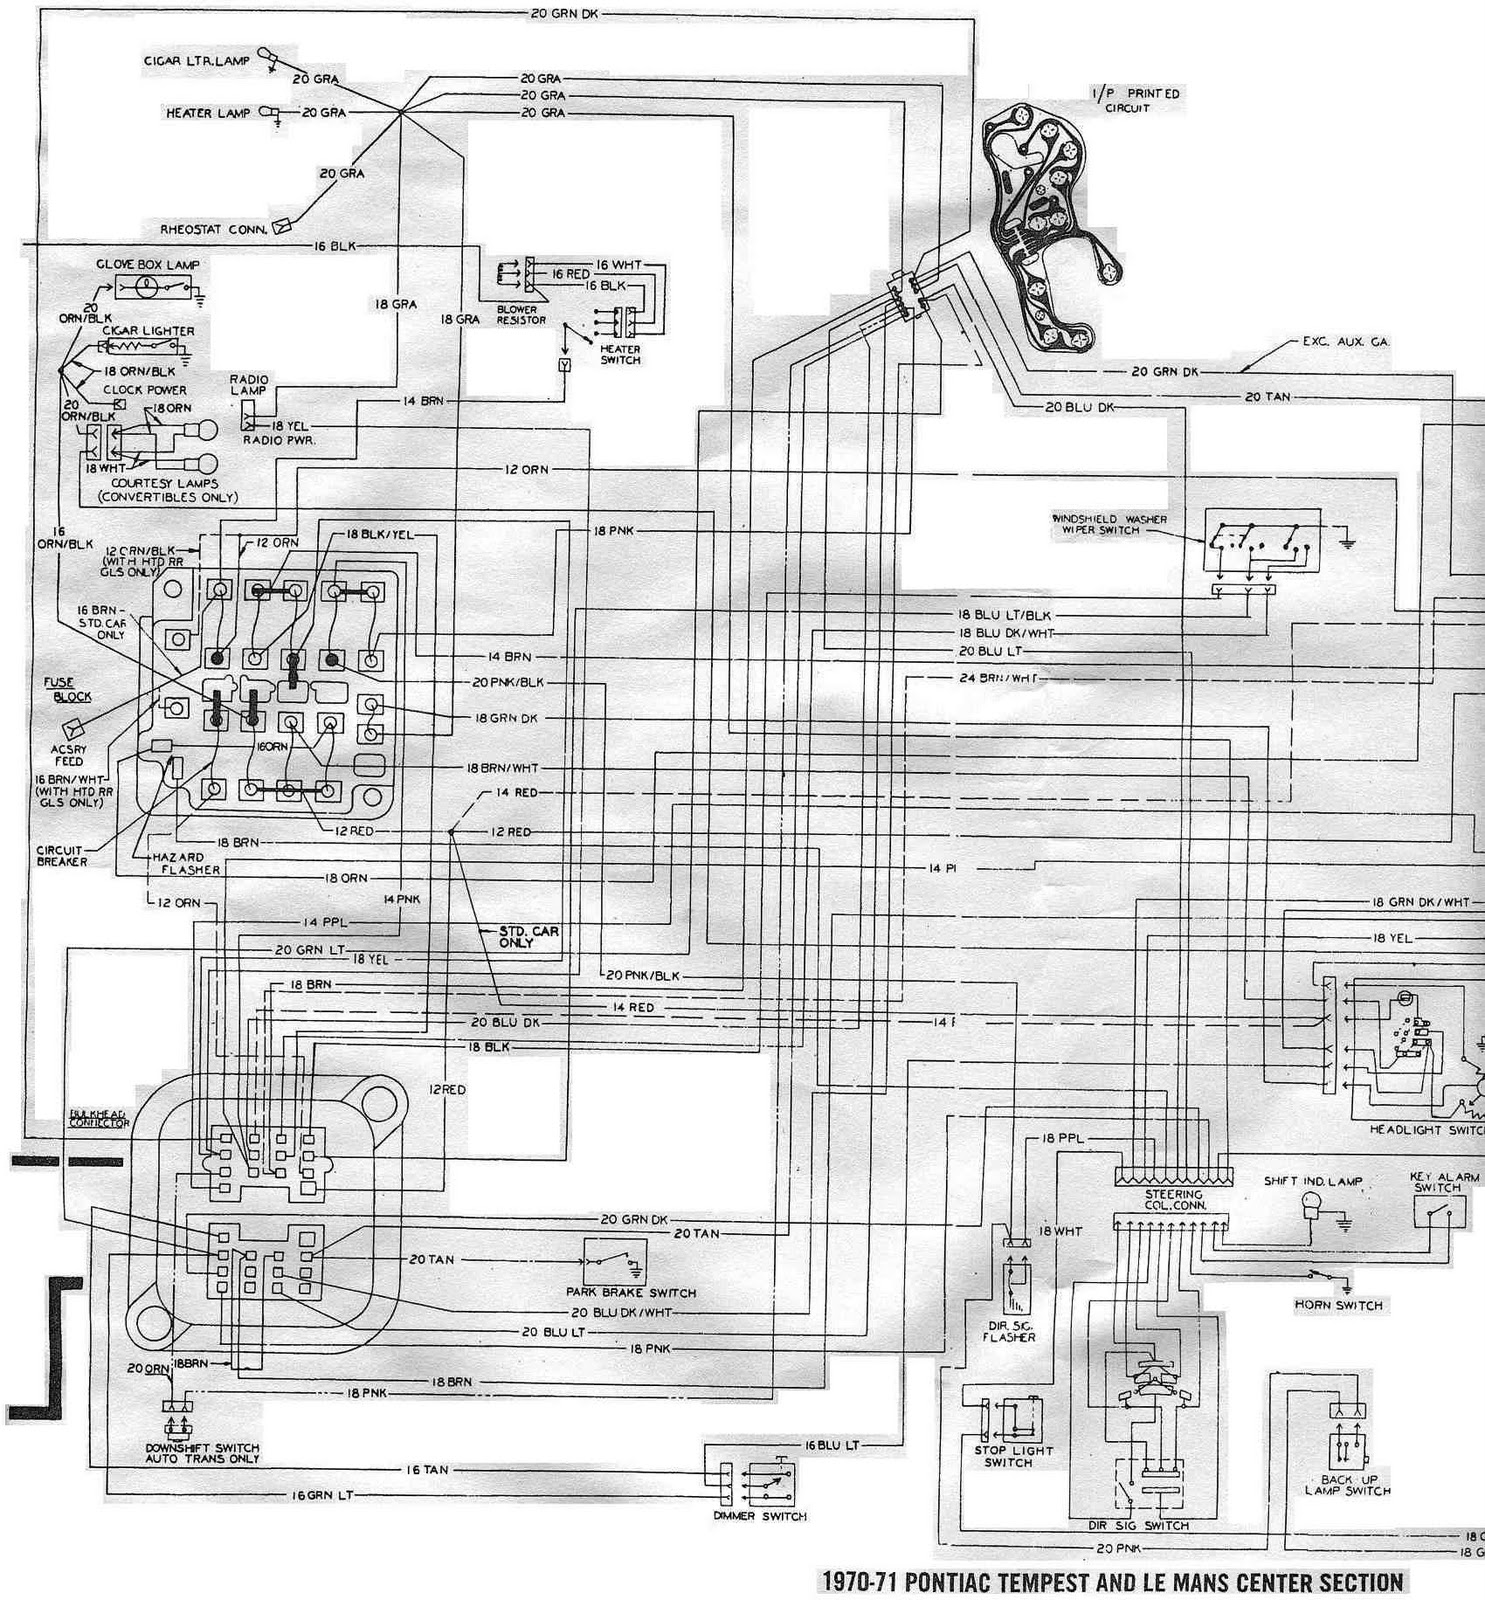 horn relay wiring diagram 71 le mans 1964 pontiac tempest wiring diagram also 1967 pontiac le mans  1964 pontiac tempest wiring diagram